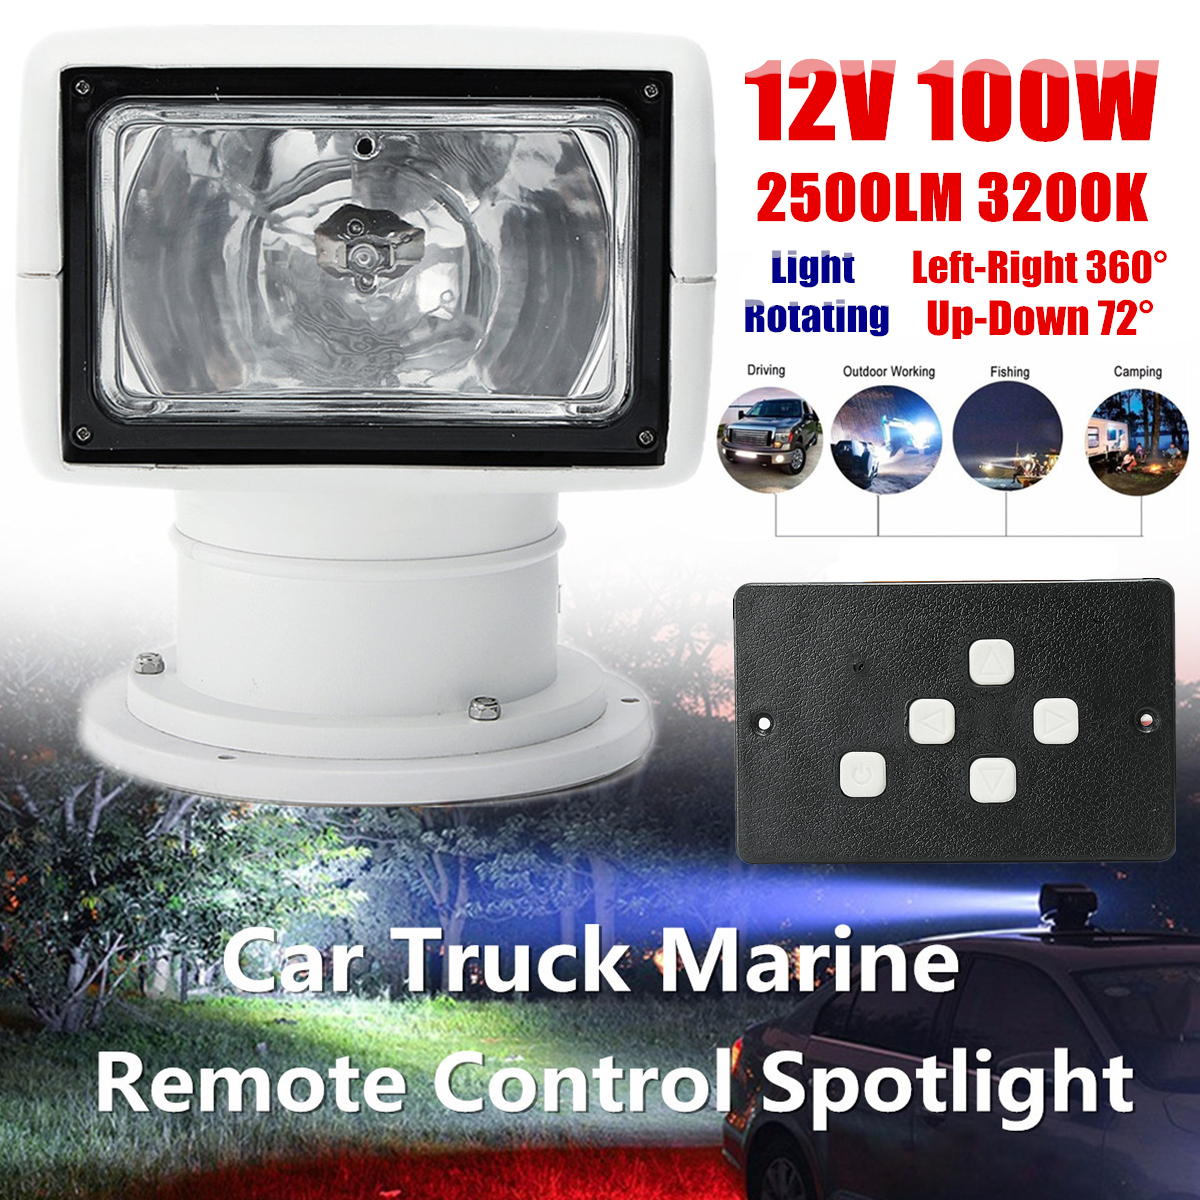 12V 100W 2500LM Boat Truck Car Spotlight 3200K PC+Aluminum Marine Searchlight Light Bulb Remote Control Multi-angled White marine boat spotlight remote control searchlight truck car rv 24v 100w bulb